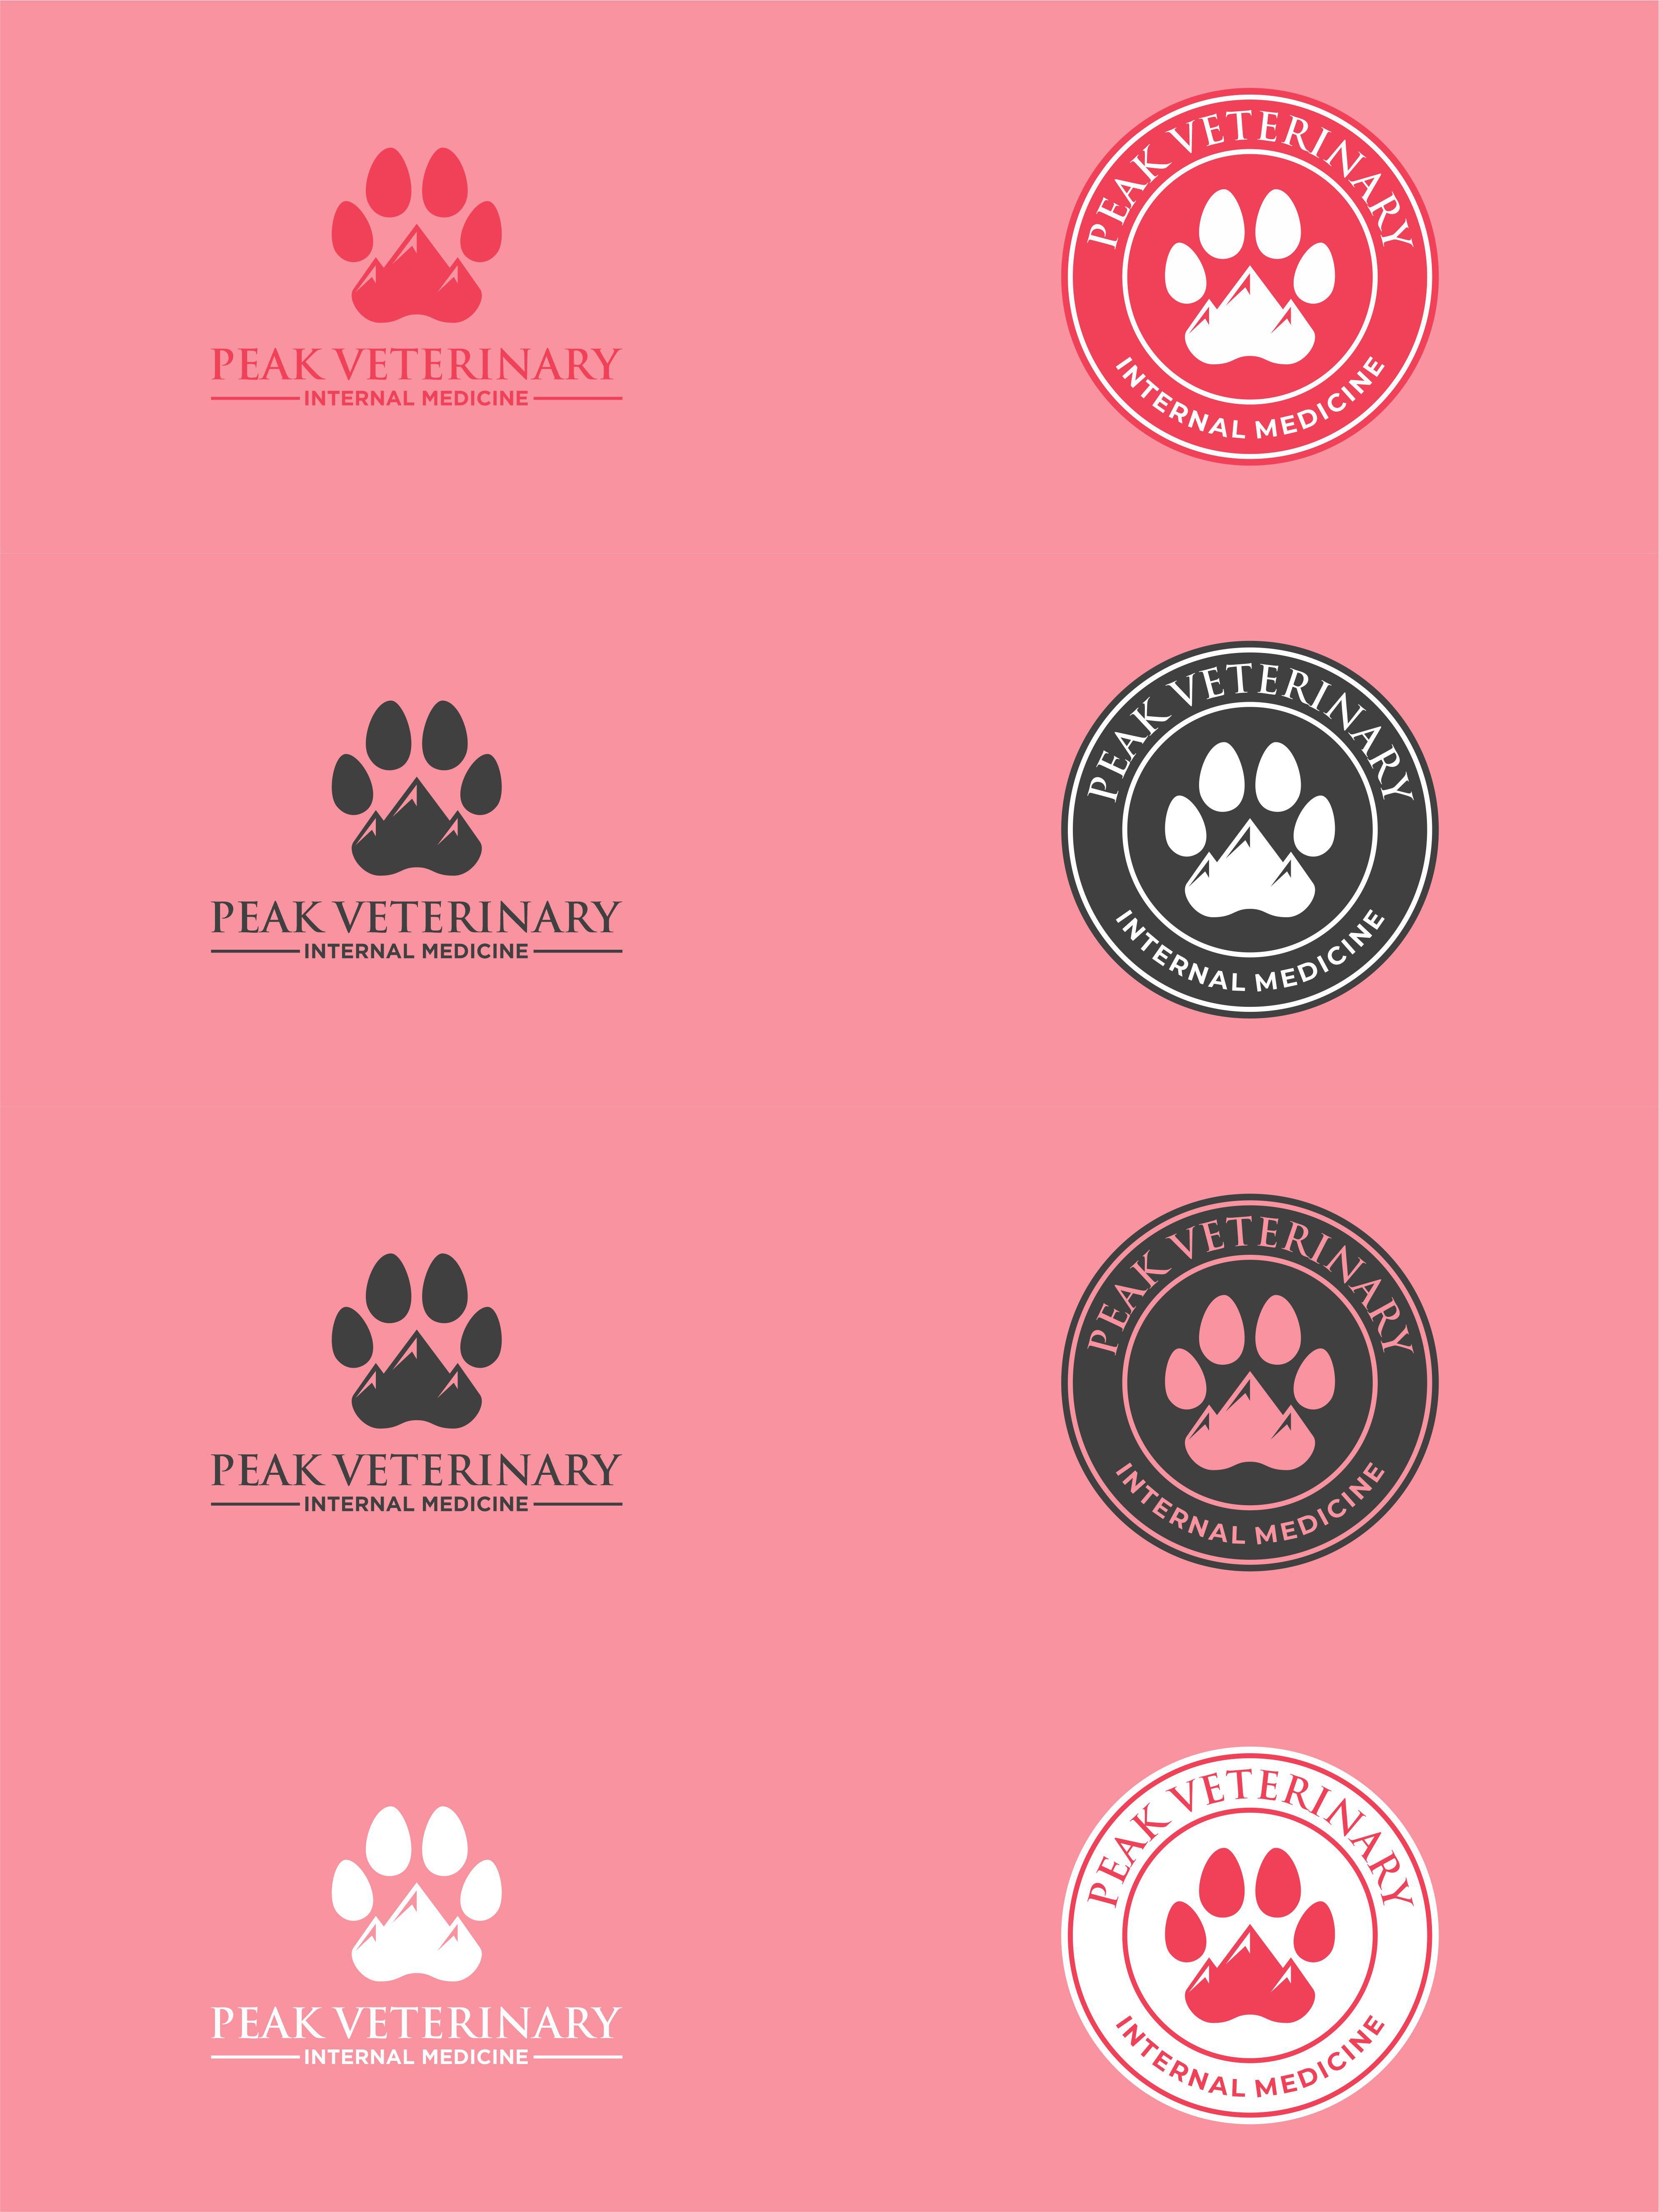 Eye catching logo for veterinary specialists in Phoenix, Arizona